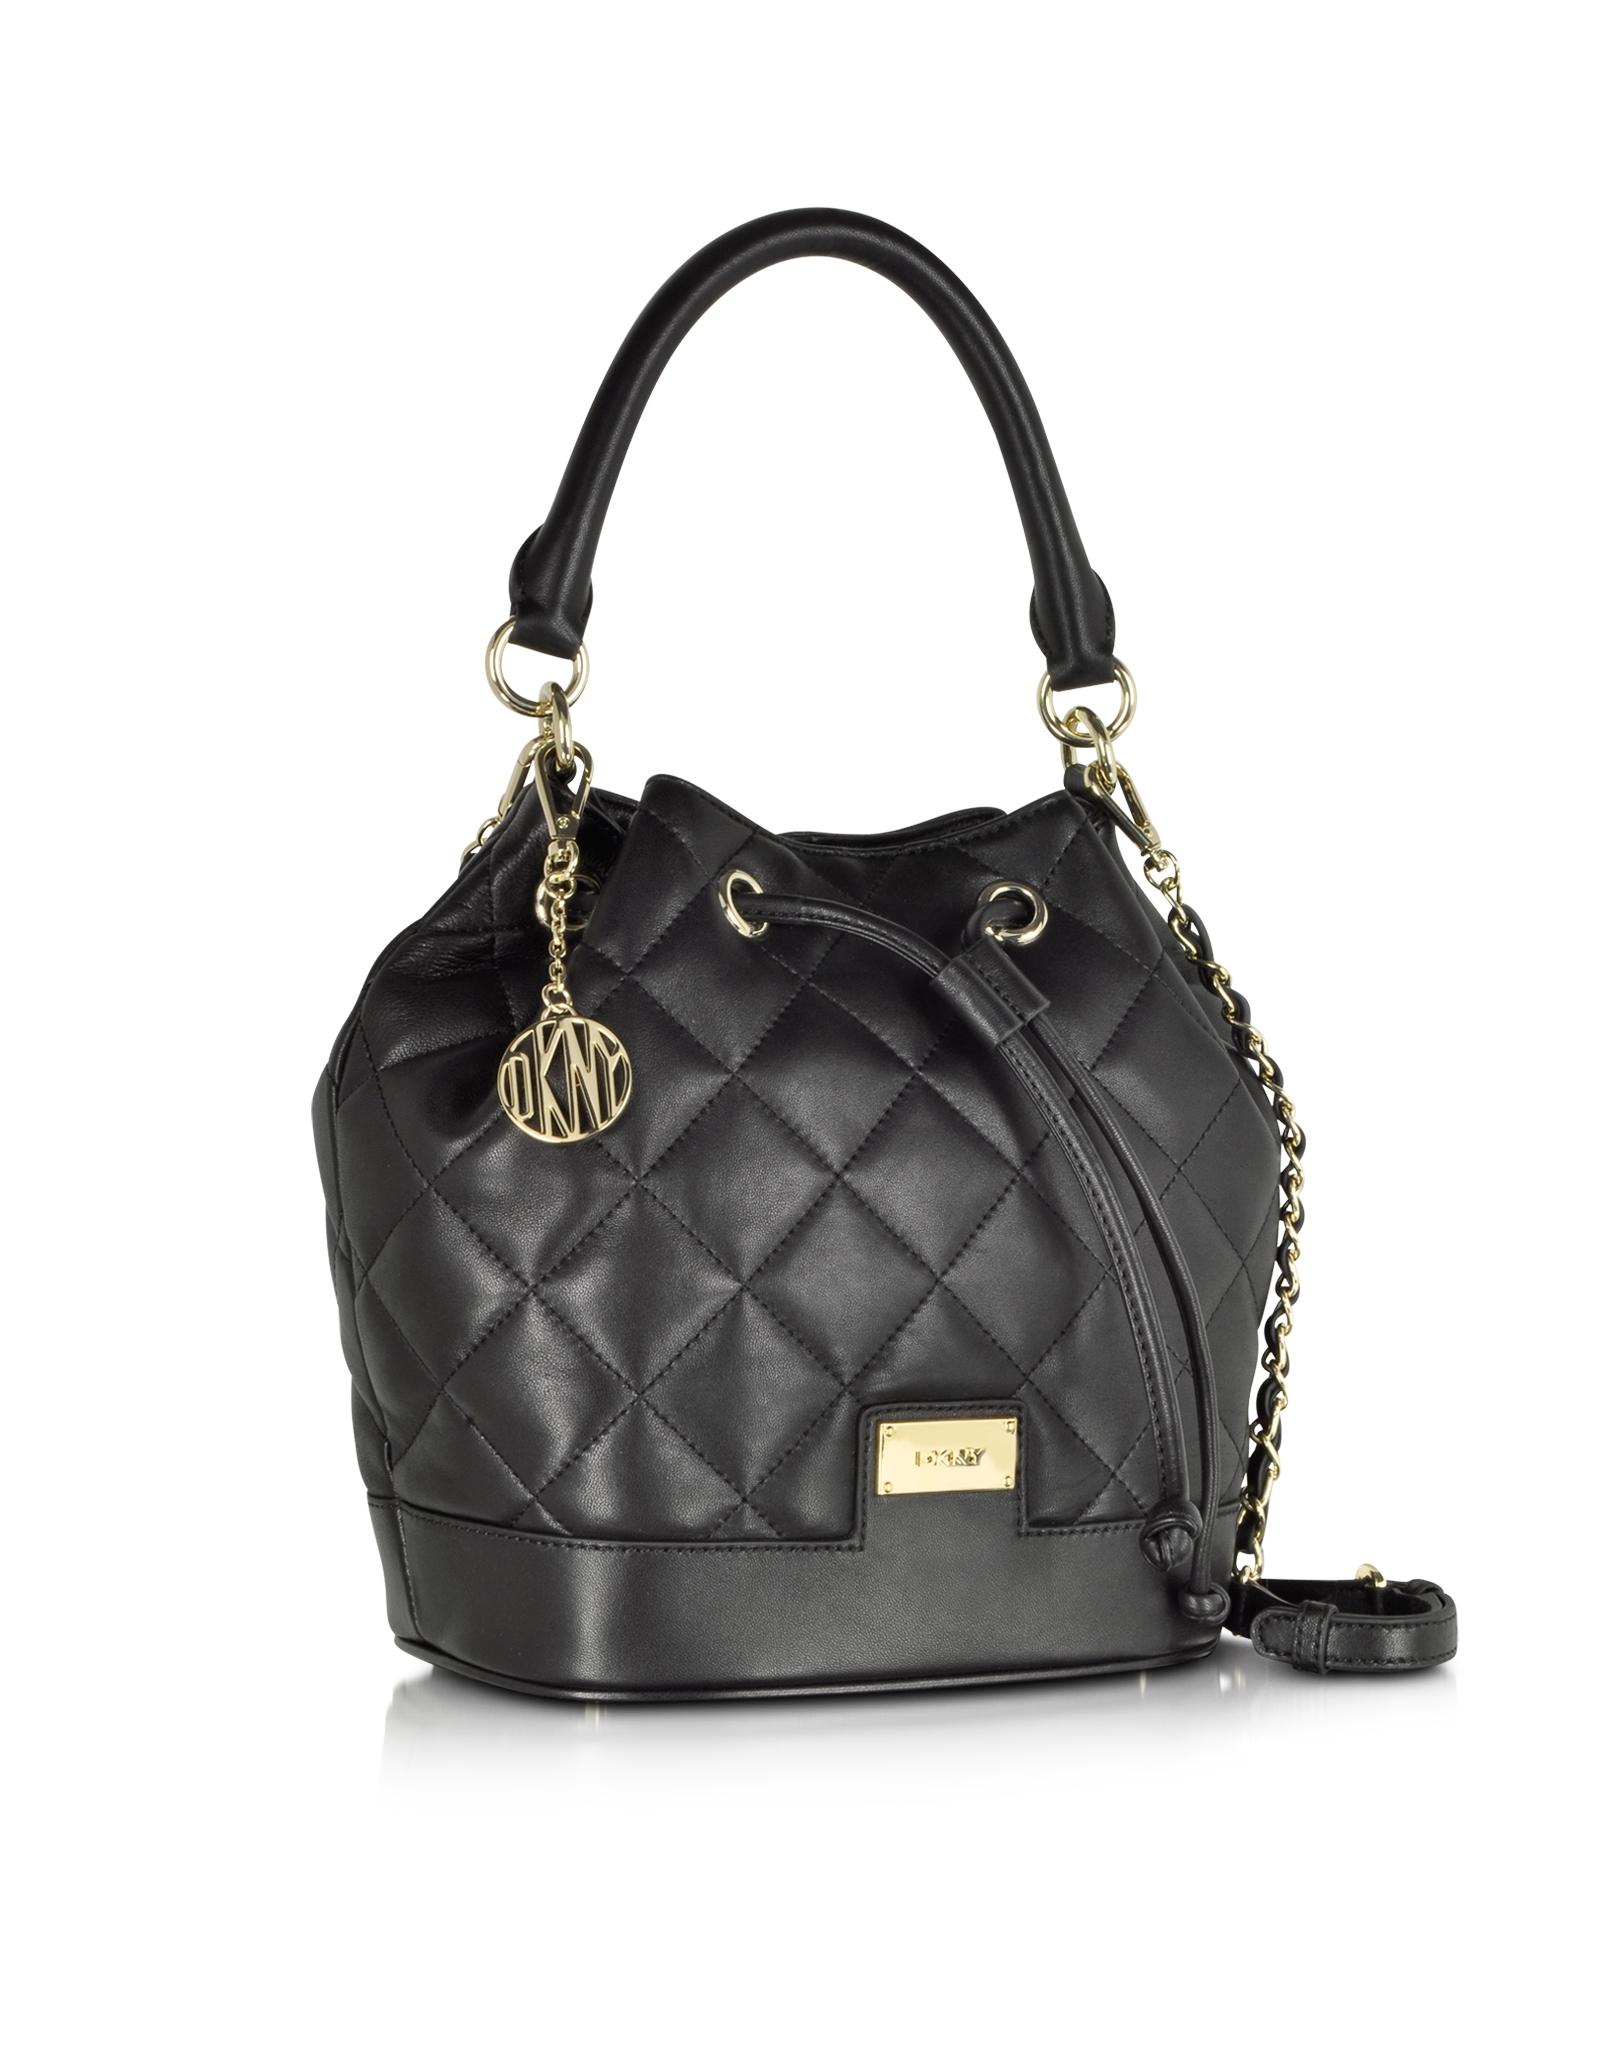 Lyst - Dkny Gansevoort Black Quilted Nappa Bucket Bag in Black : dkny black quilted purse - Adamdwight.com